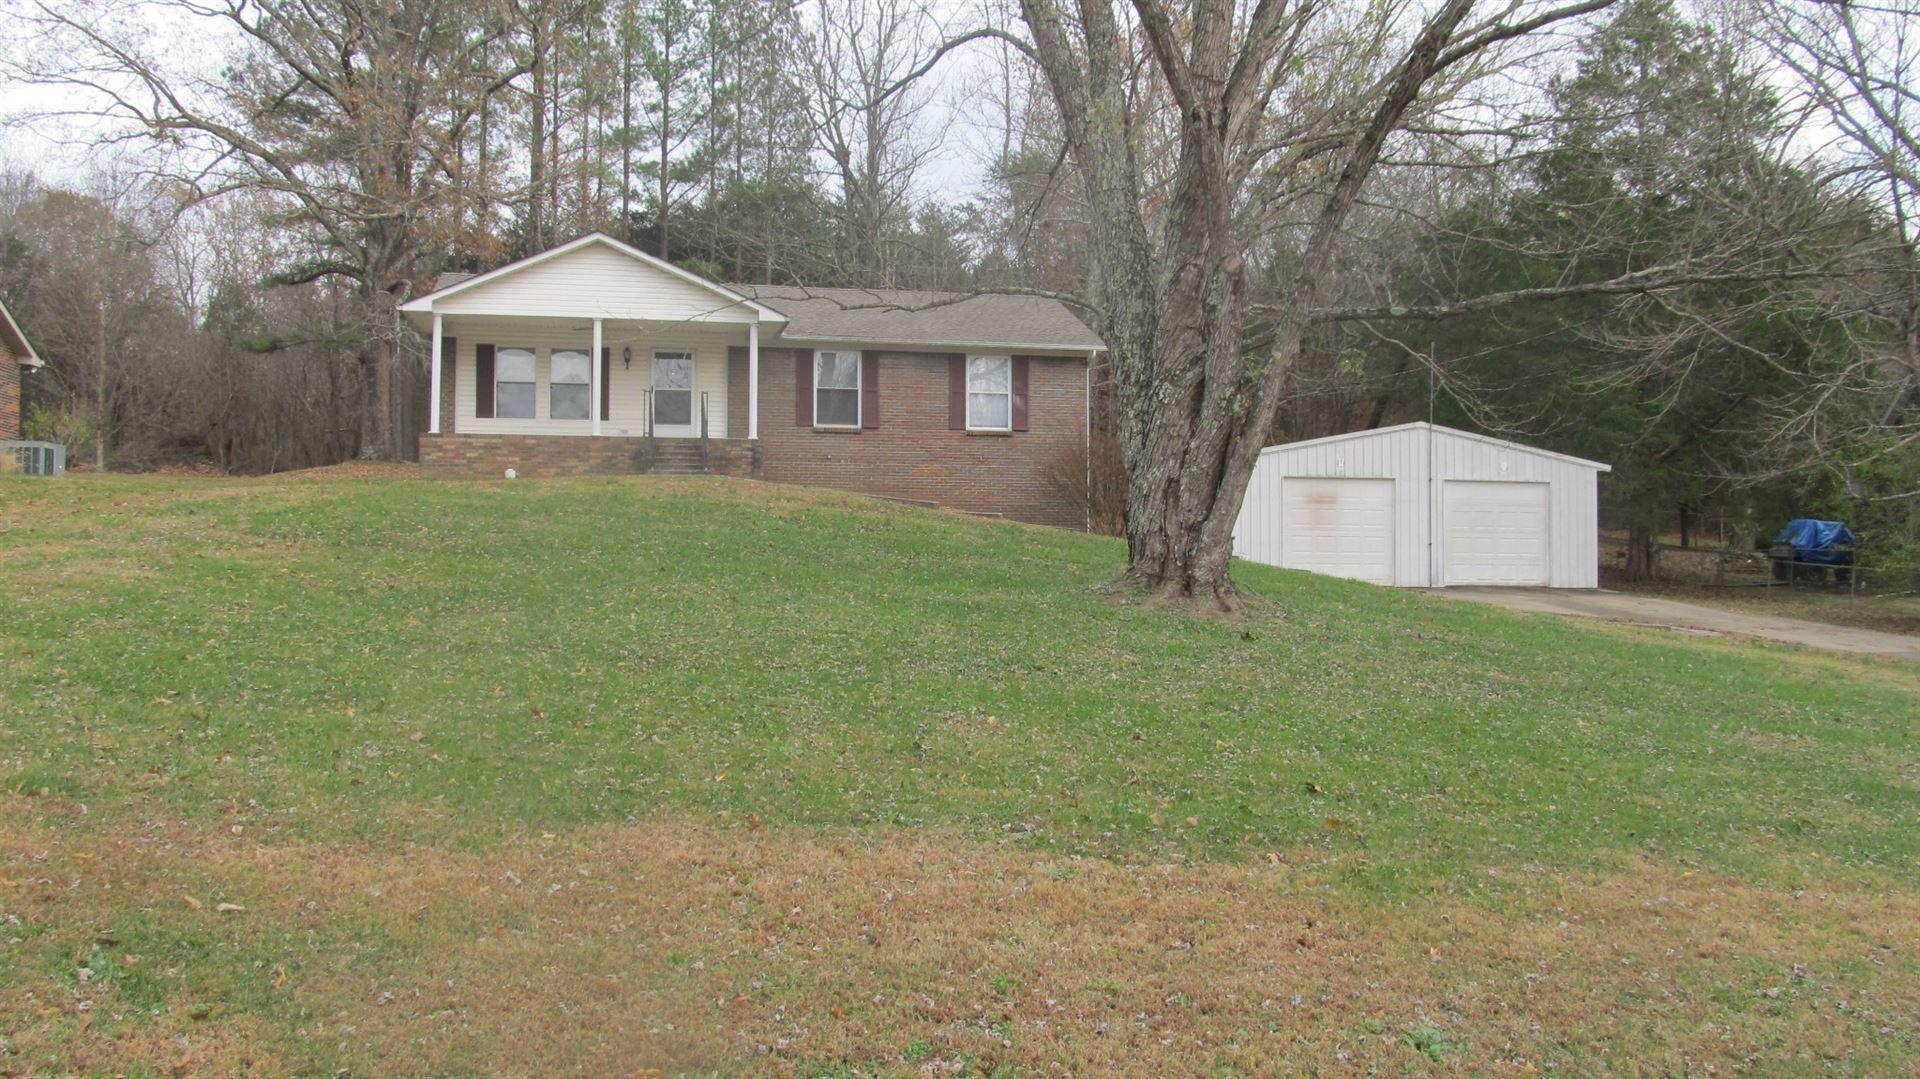 1935 Dinsmore Rd, Clarksville, TN 37040 - MLS#: 2209083